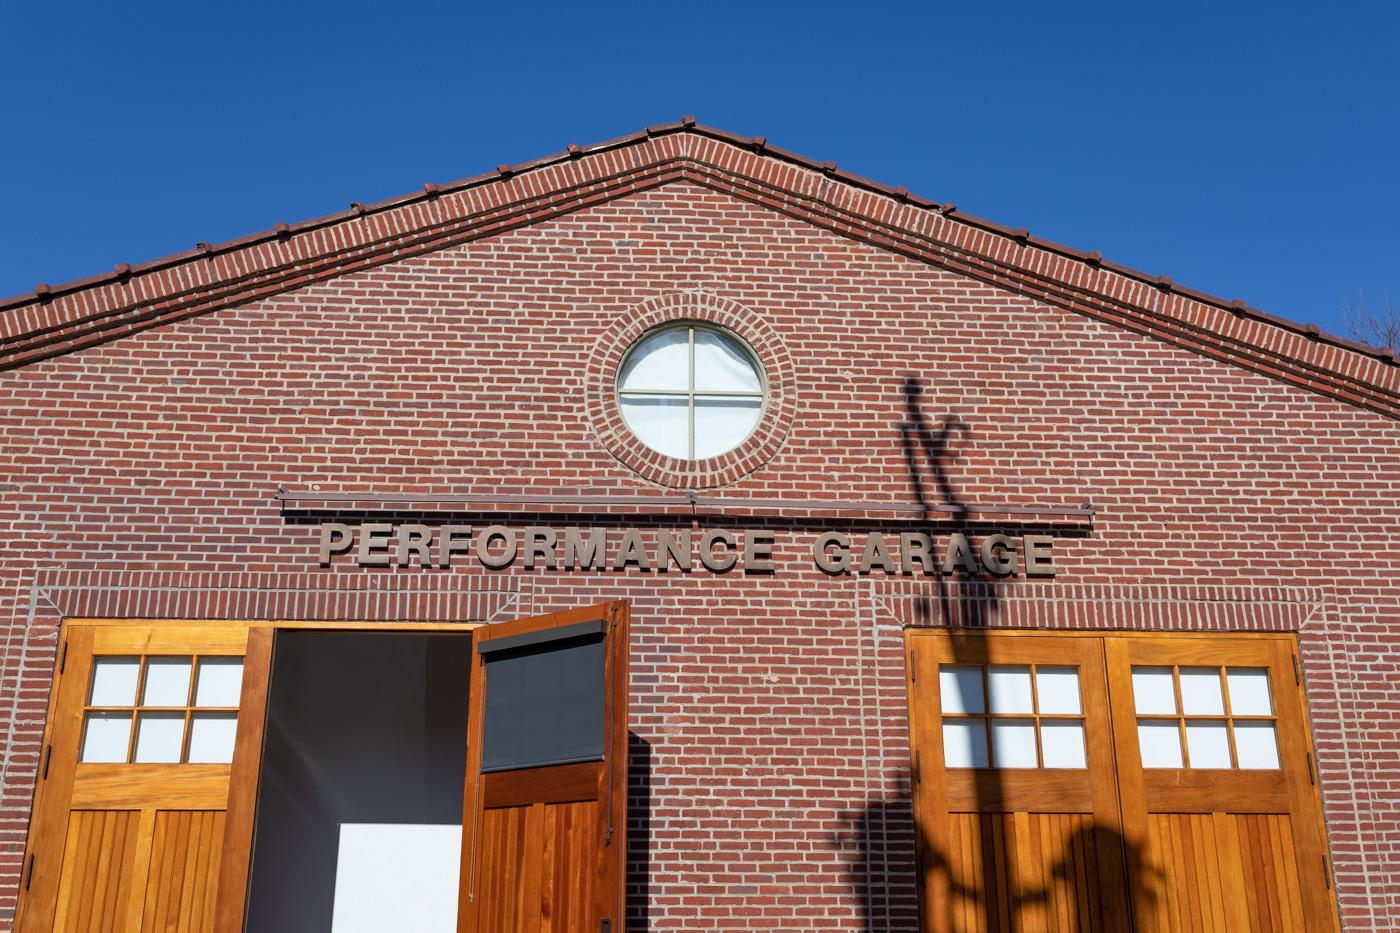 Performance Garage